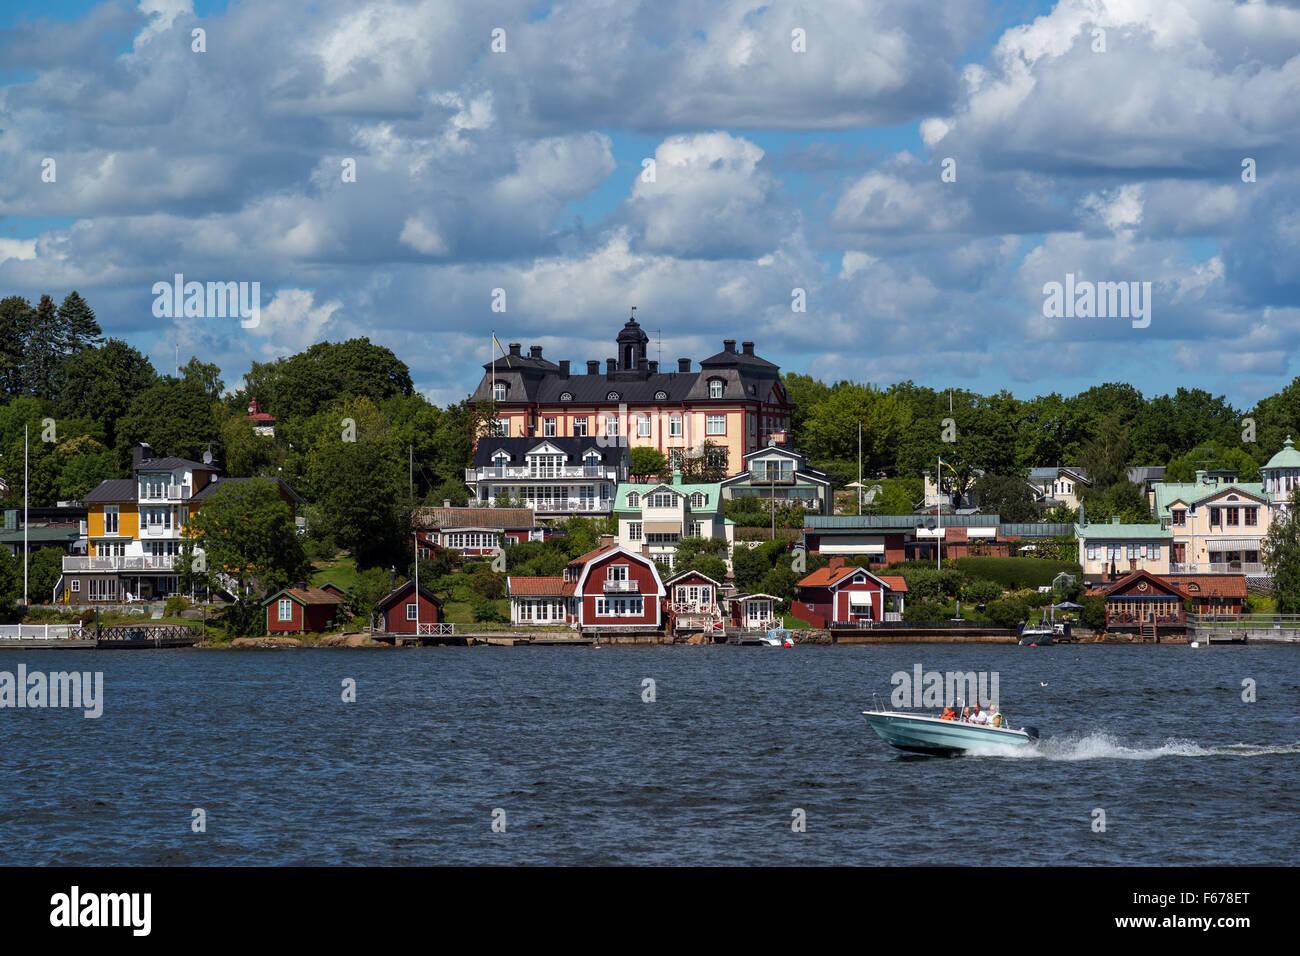 The Stockholm archipelago, Baltic Sea, Sweden - Stock Image